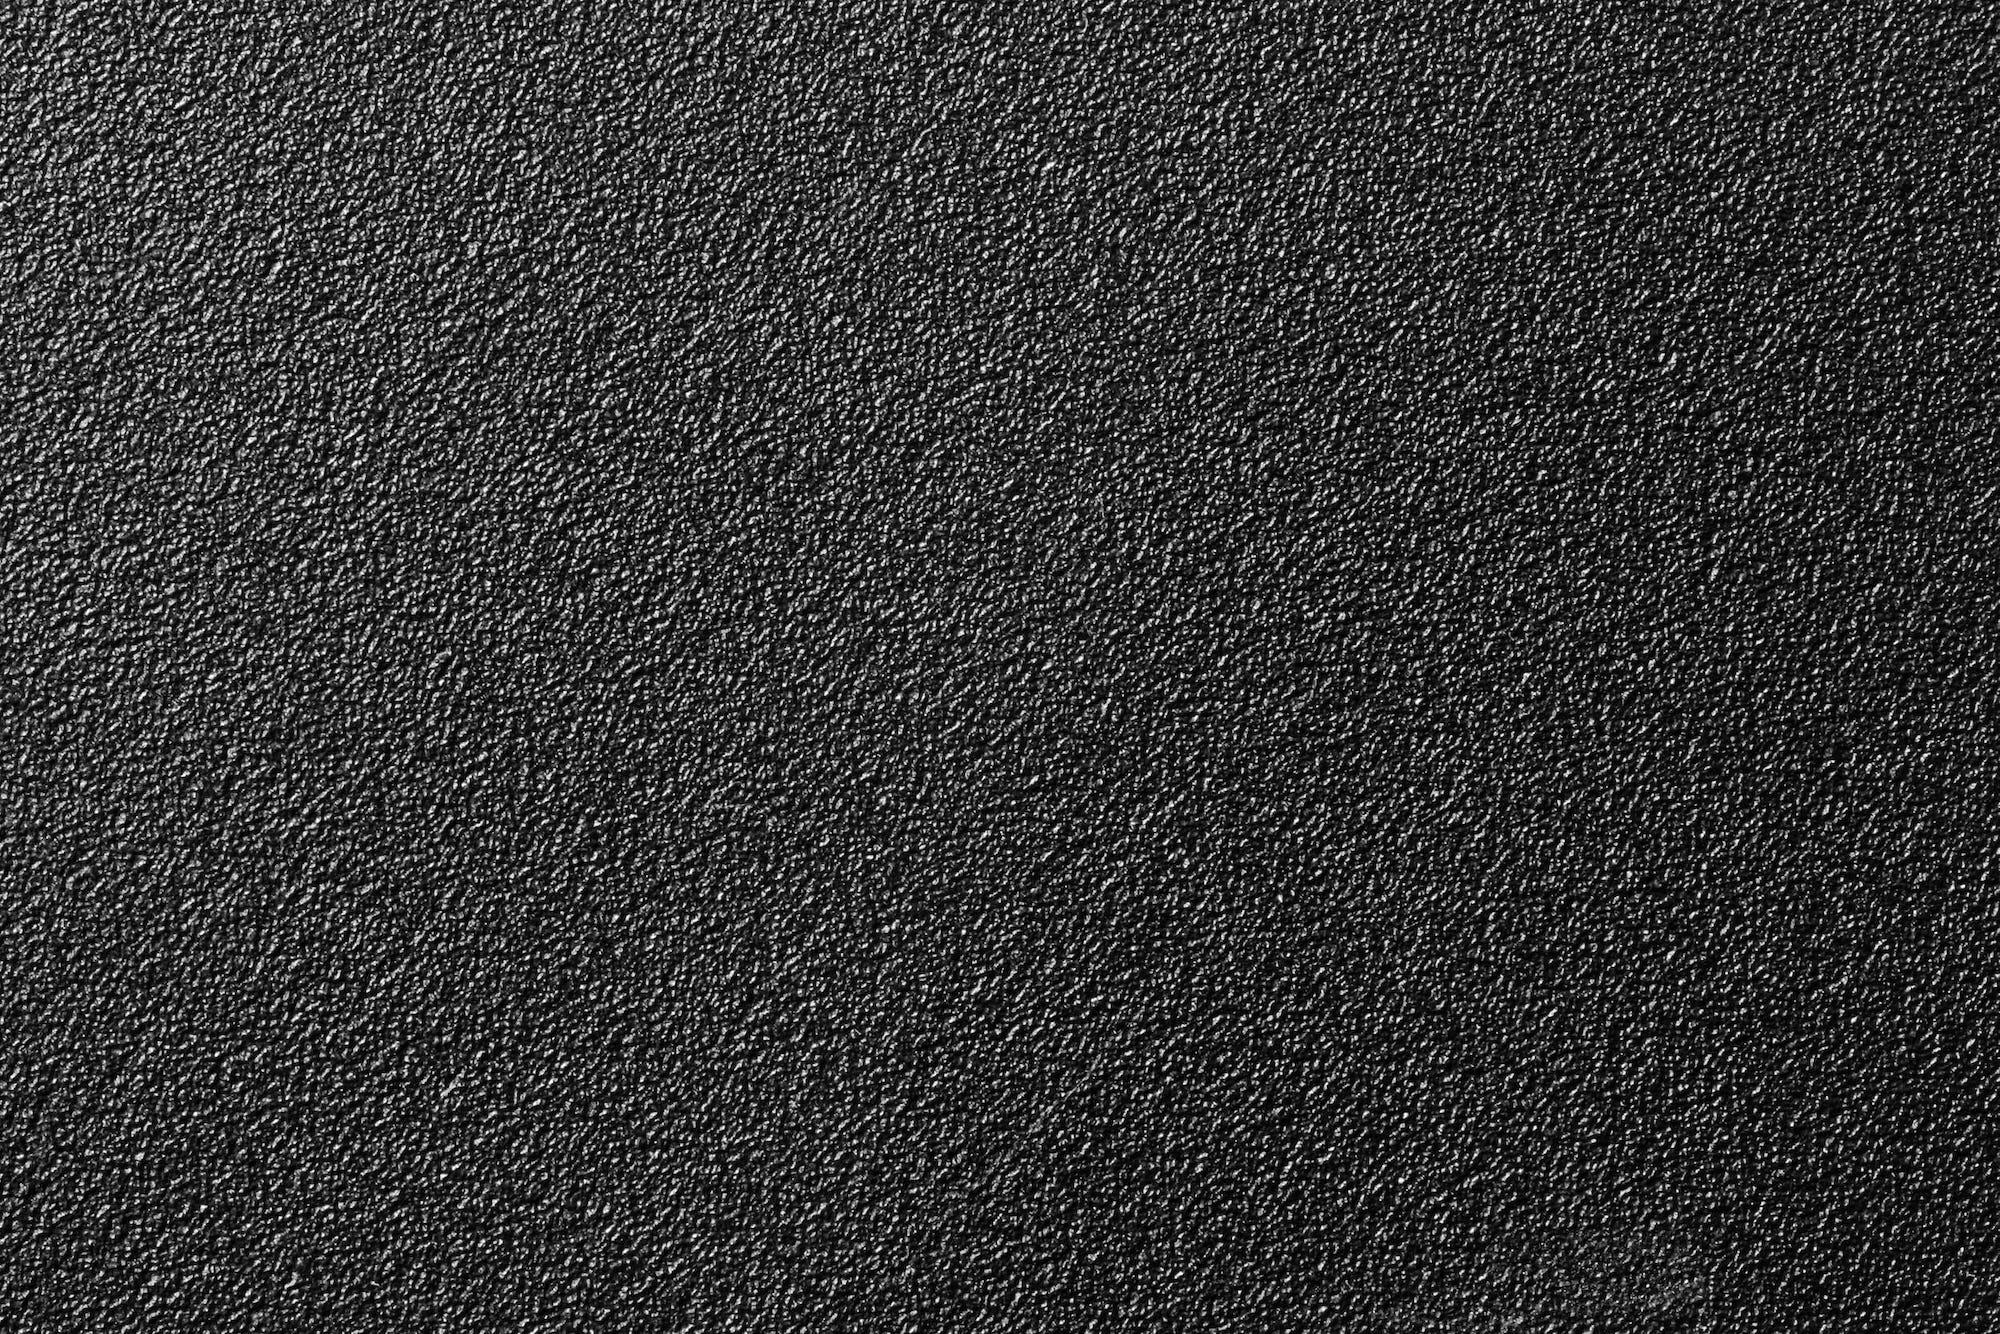 black-road-texture-min